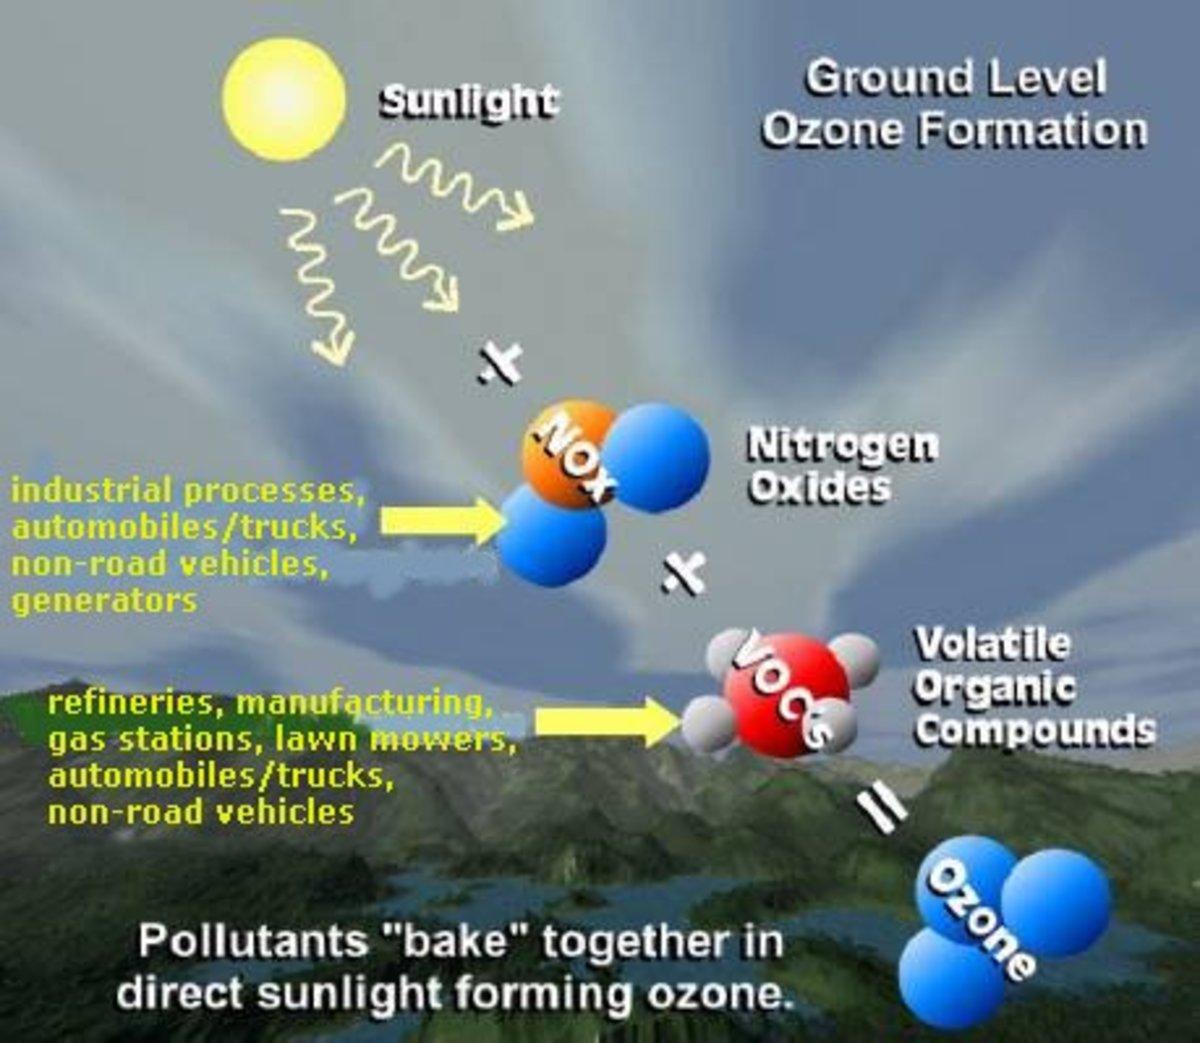 Ground Ozone